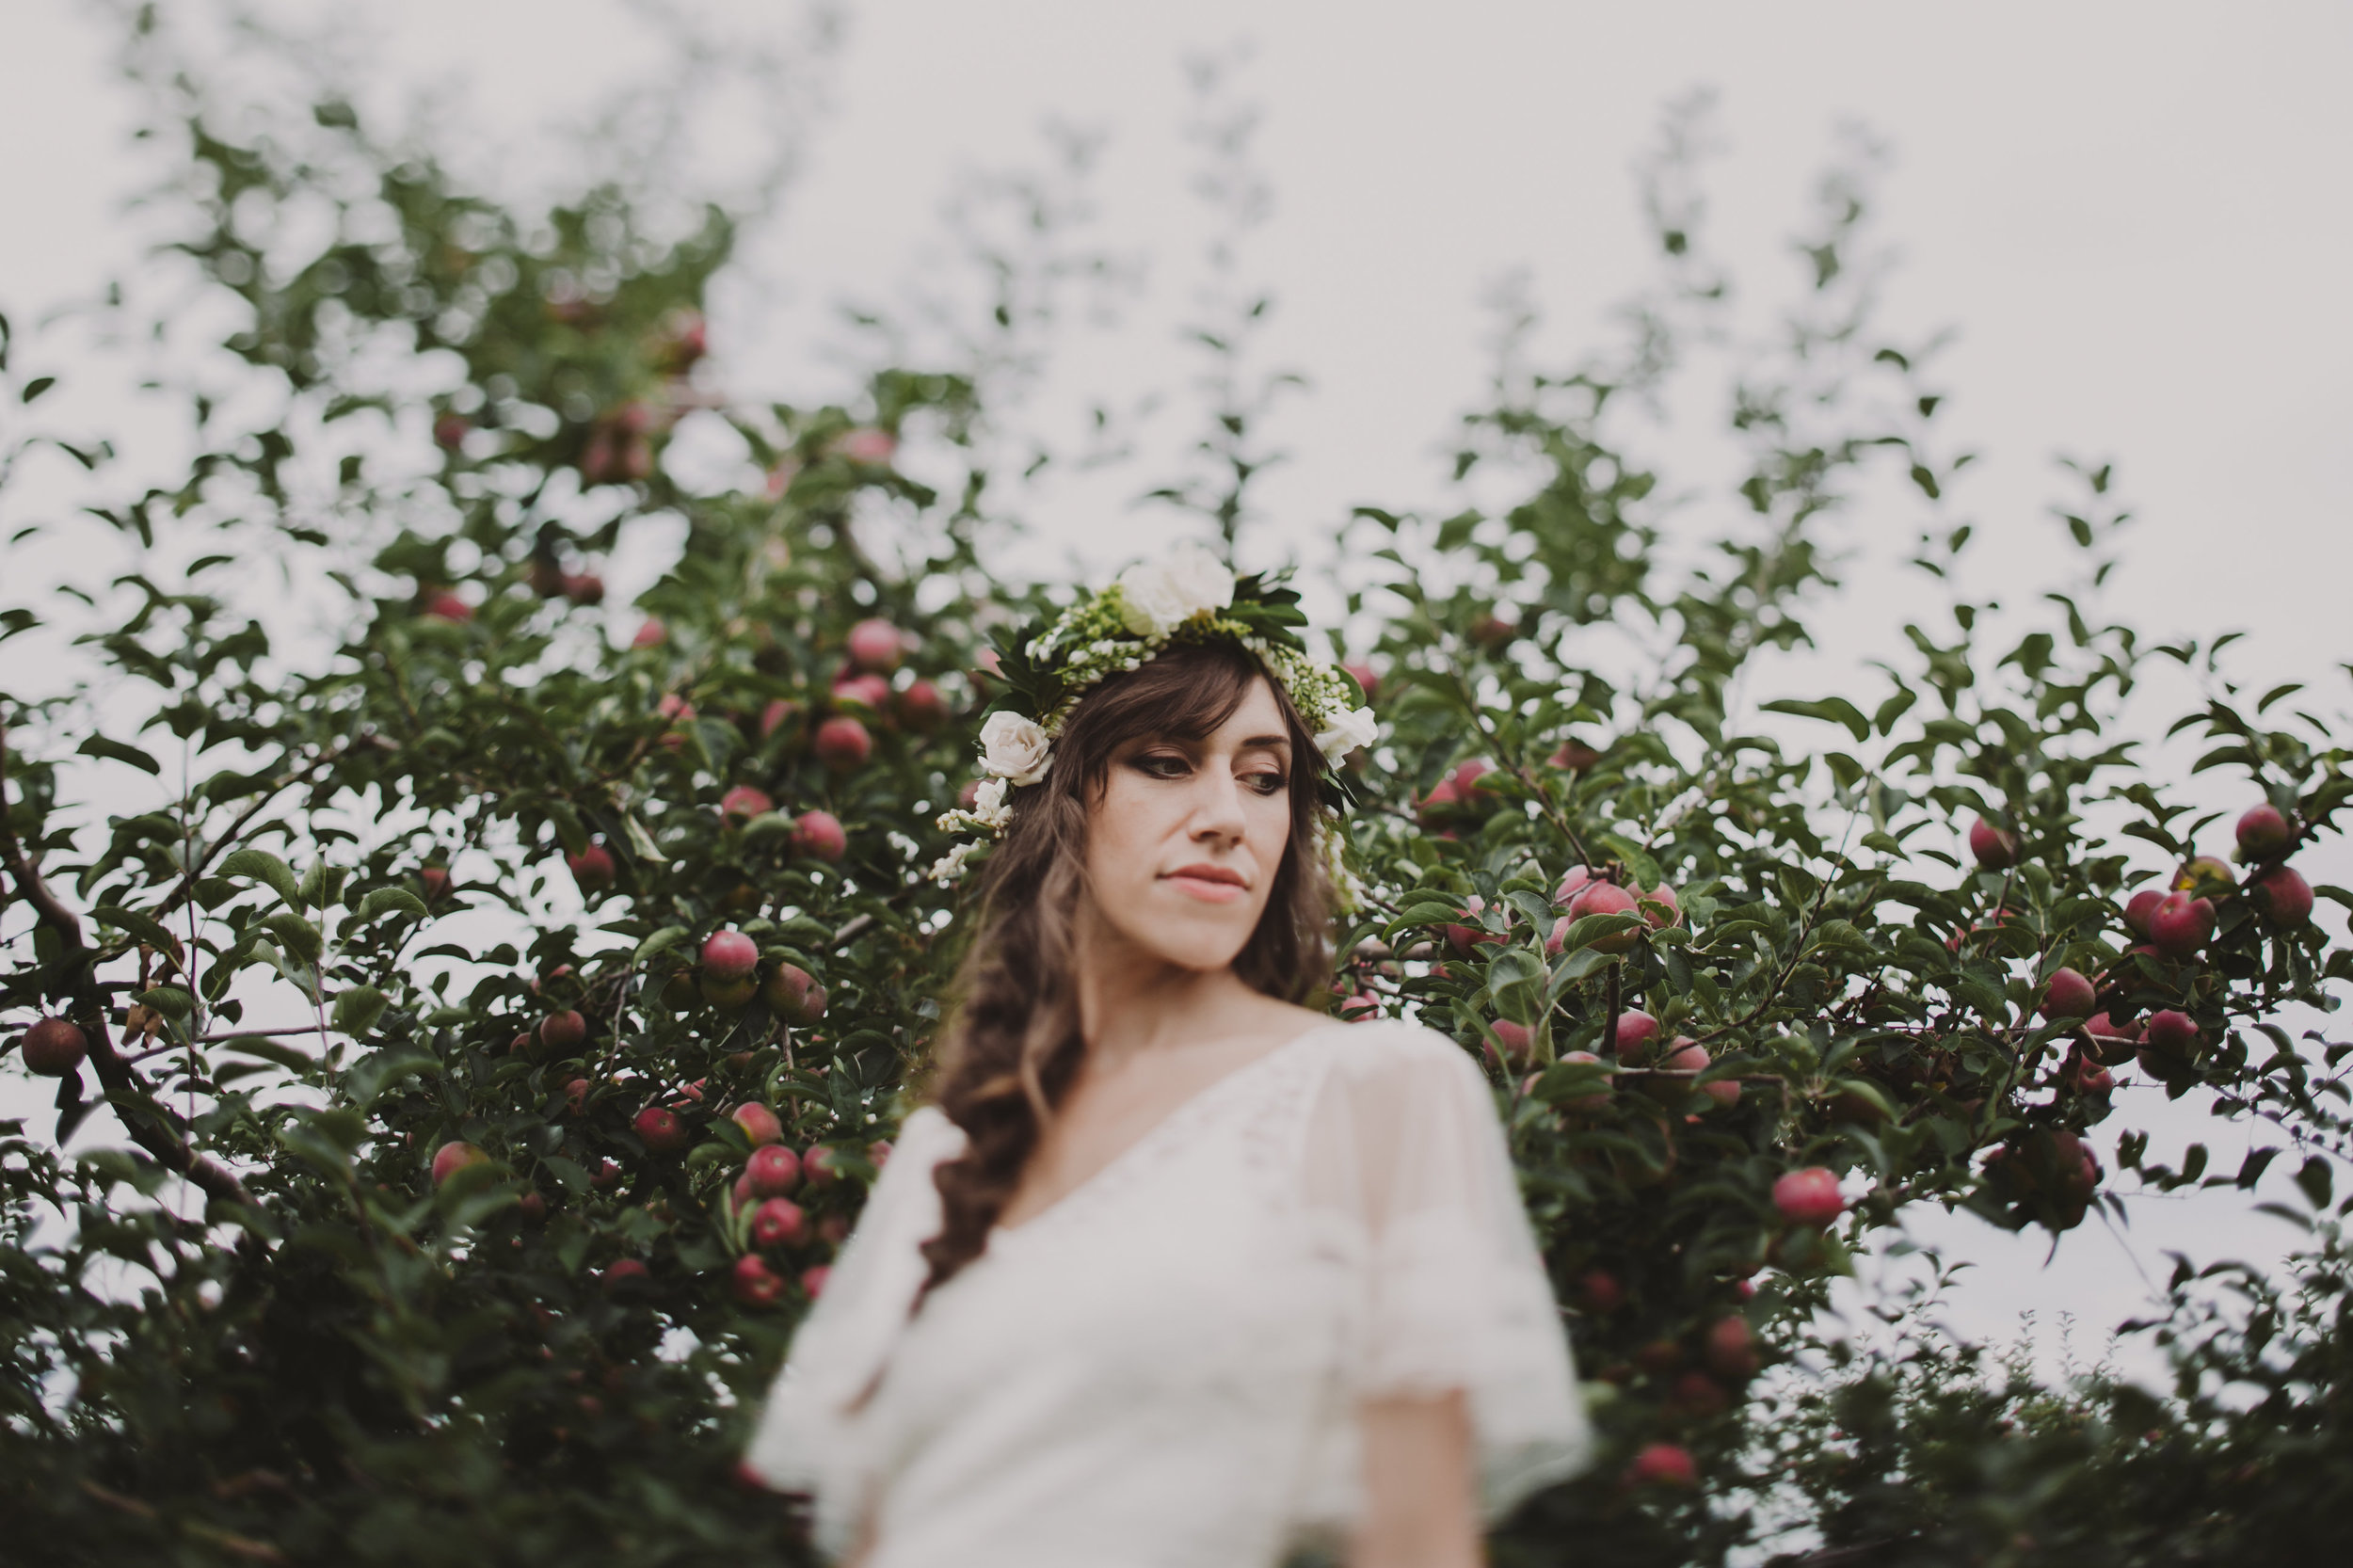 LIBERTY_VIEW_FARM_HIGHLAND_NY_WEDDING_CHELLISE_MICHAEL_PHOTOGRAPHY802.JPG